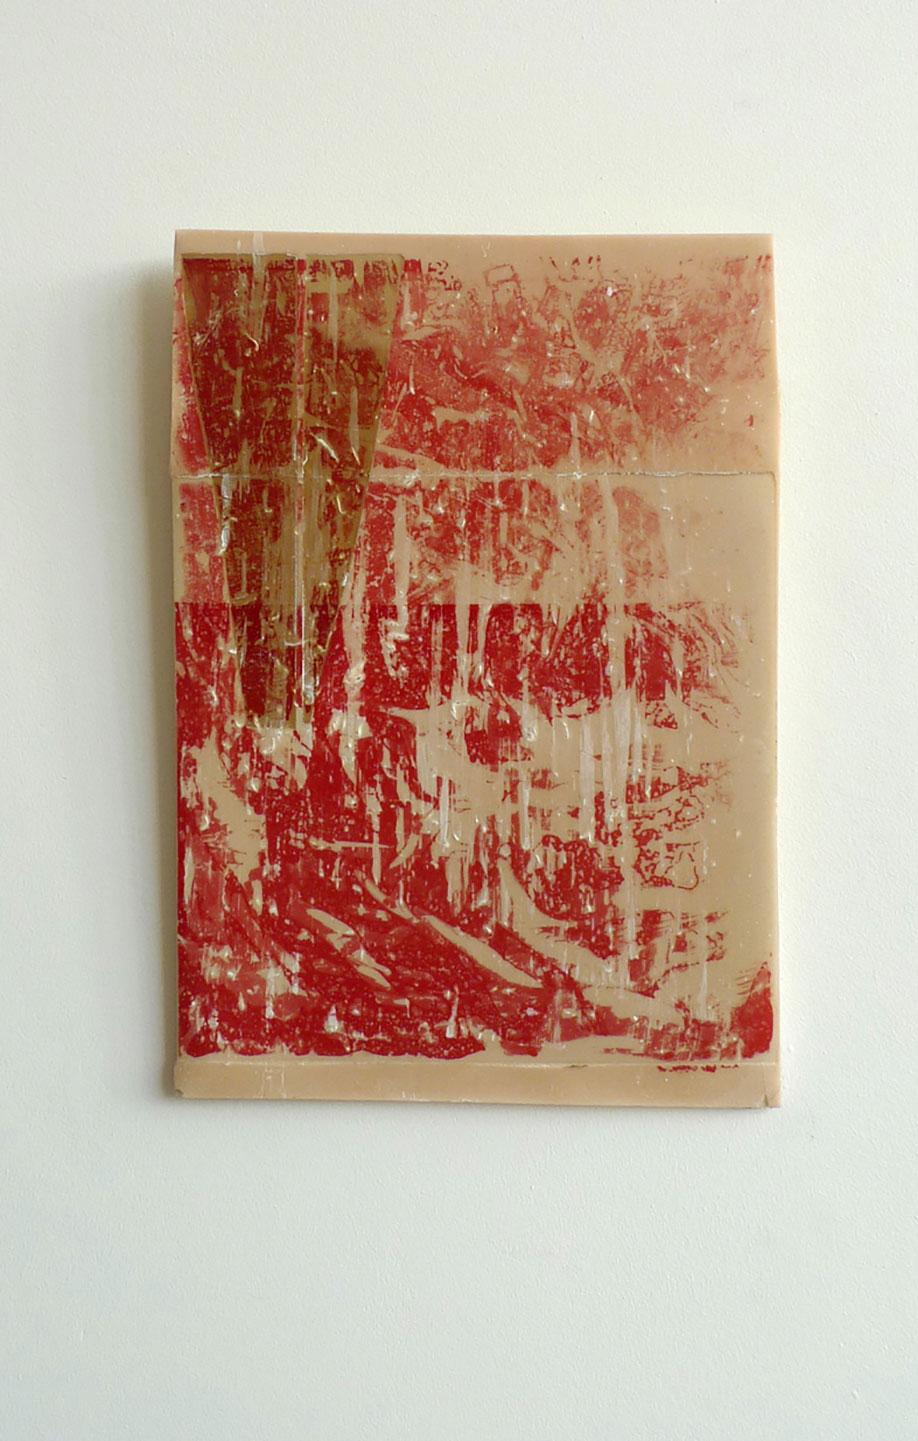 <b>Title:</b>Belt<br /><b>Year:</b>2014<br /><b>Medium:</b>Polyester resin<br /><b>Size:</b>38 x 28 x 3 cm